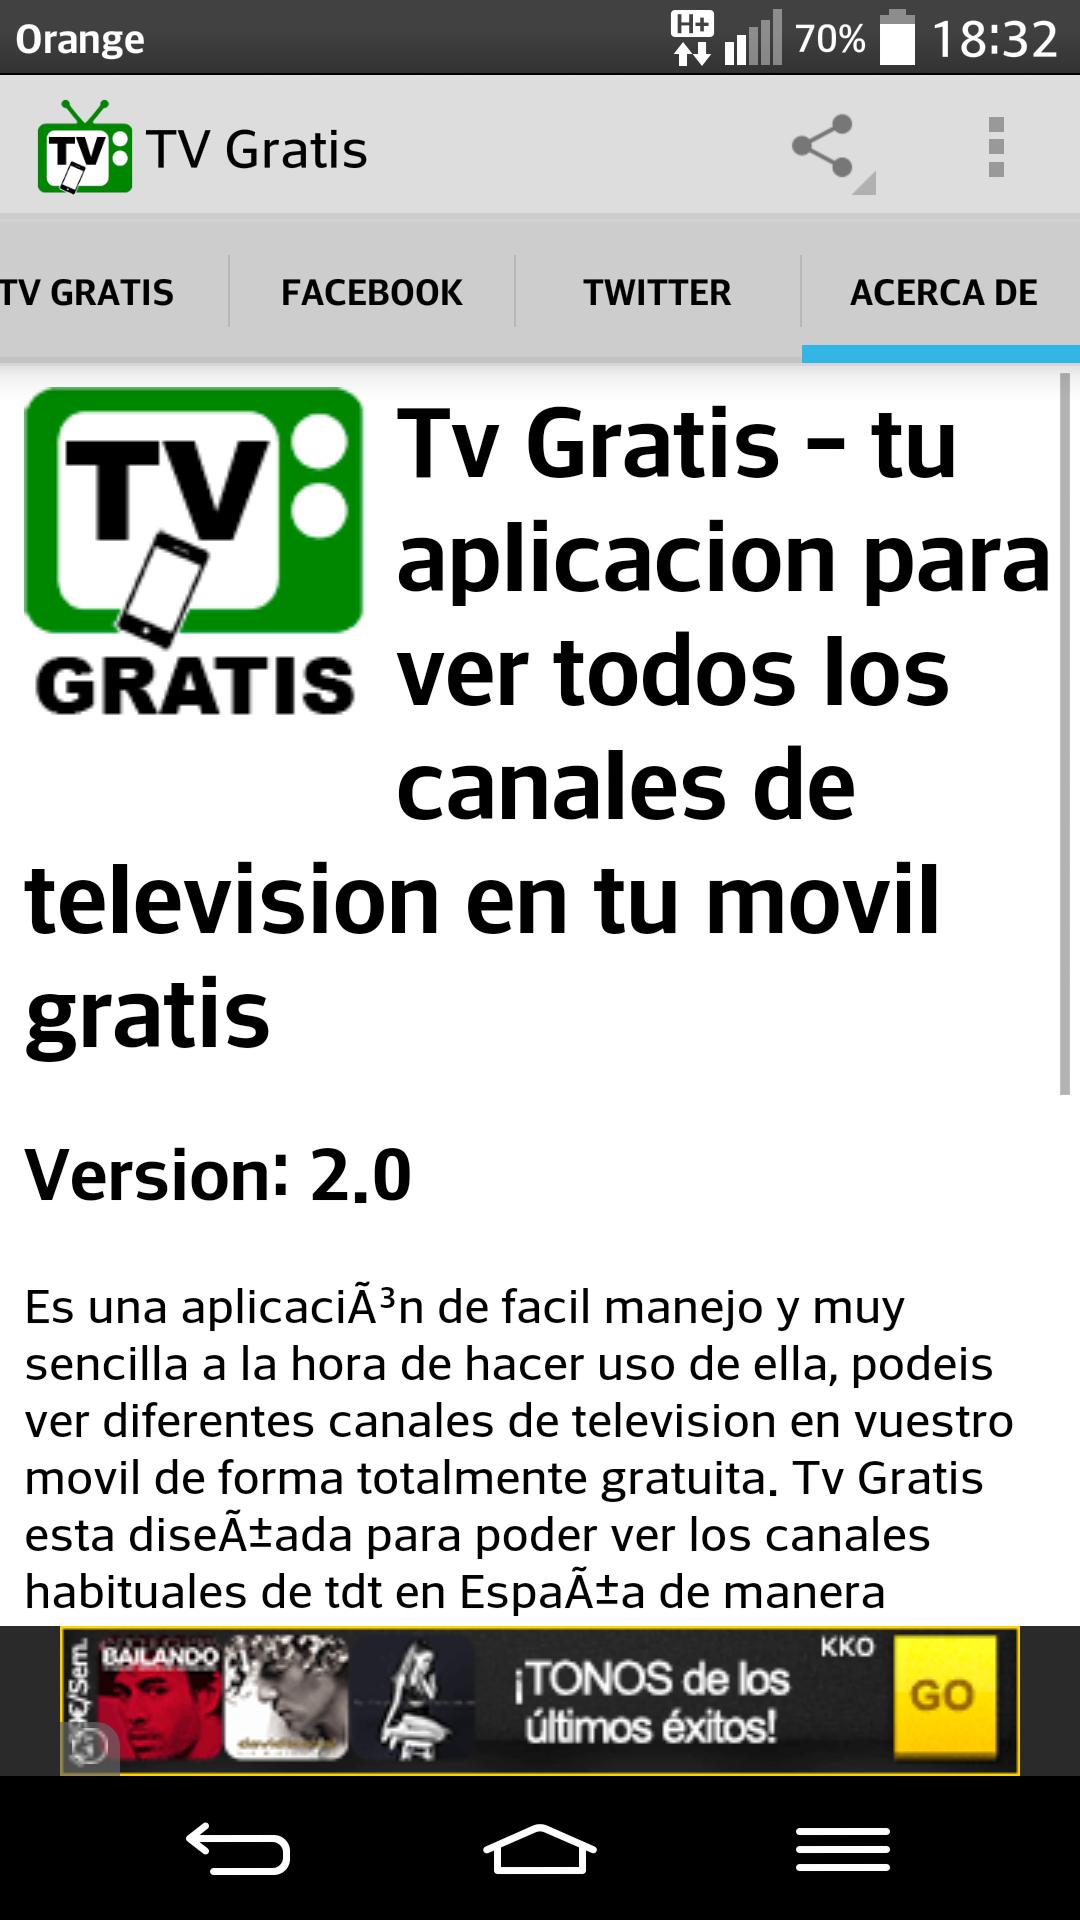 Tv gratis television: Amazon.es: Appstore para Android